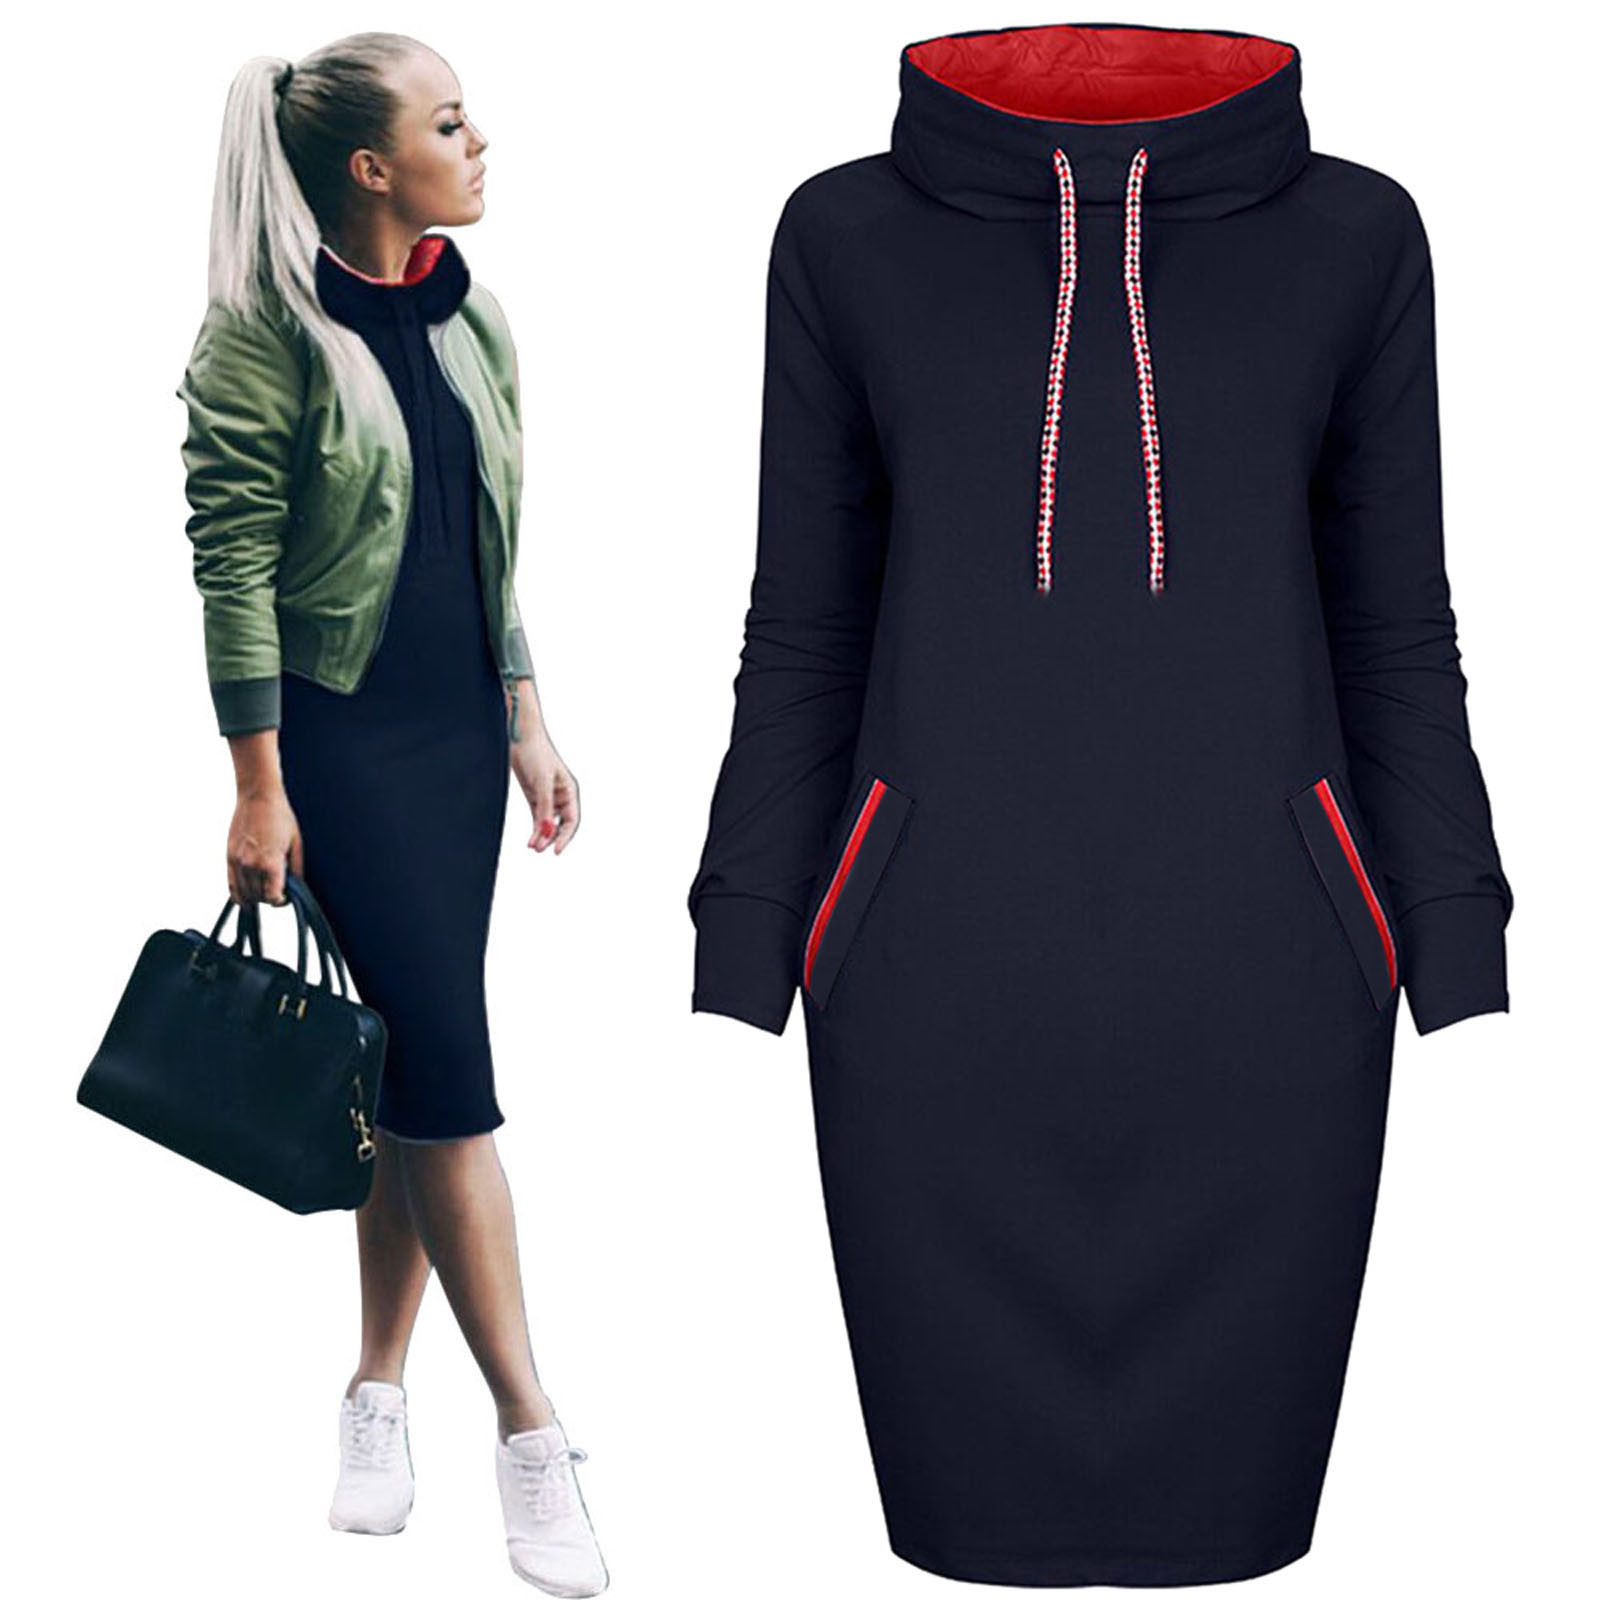 Women Autumn Warm Hooded Dress Casual Winter Shirt Dress Ladies Long Sleeve Fit Slim Sweatshirt